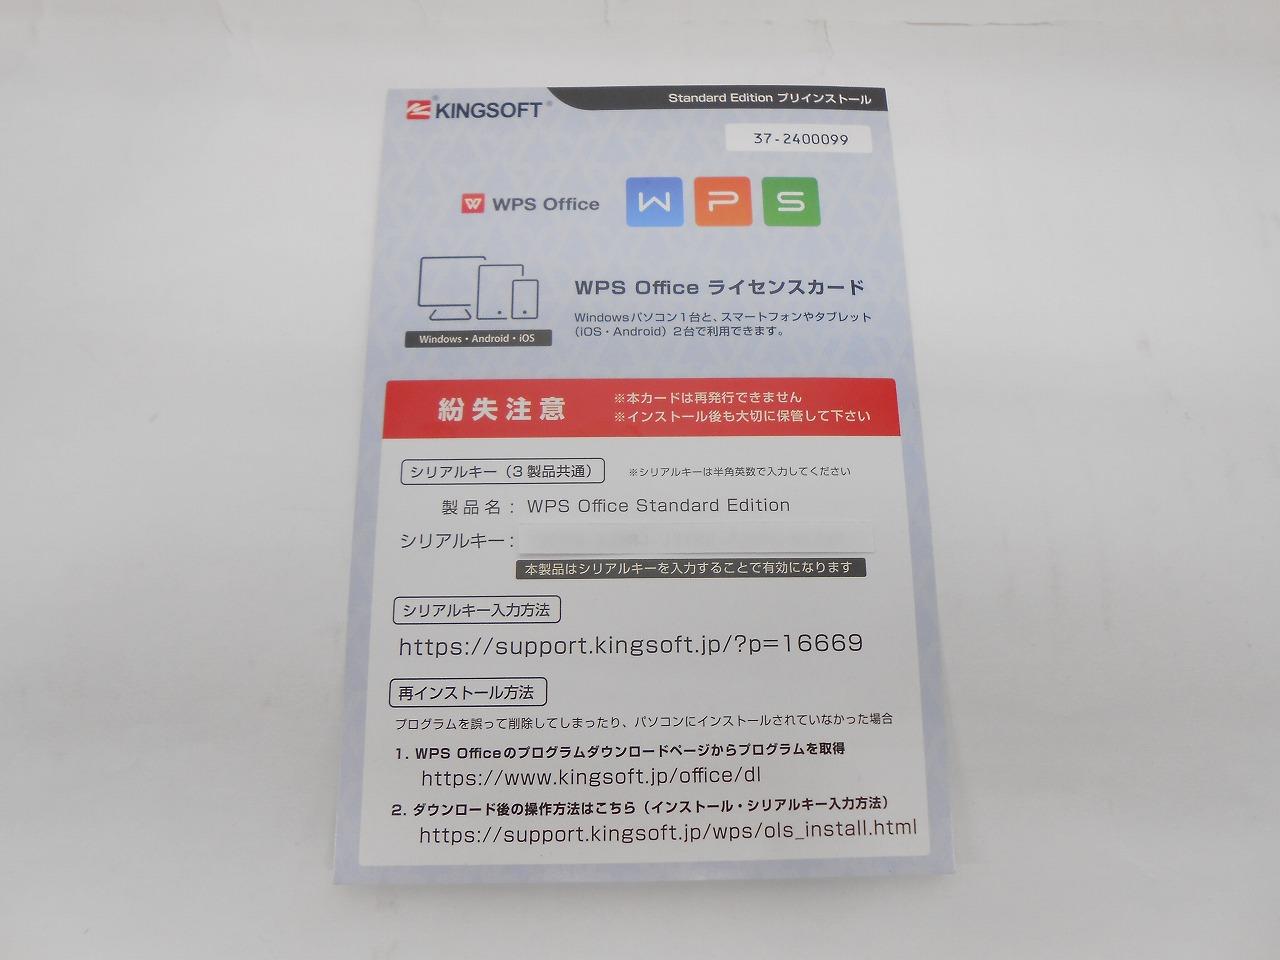 【SPRING SALE】【WPSOffice付】【中古】Panasonic Let'snote CF-XZ6/2017年モデル/Corei5 7300U 2.6GHz/メモリ8GB/SSD256GB/12インチ/Windows10Pro【3ヶ月保証】【足立店発送】